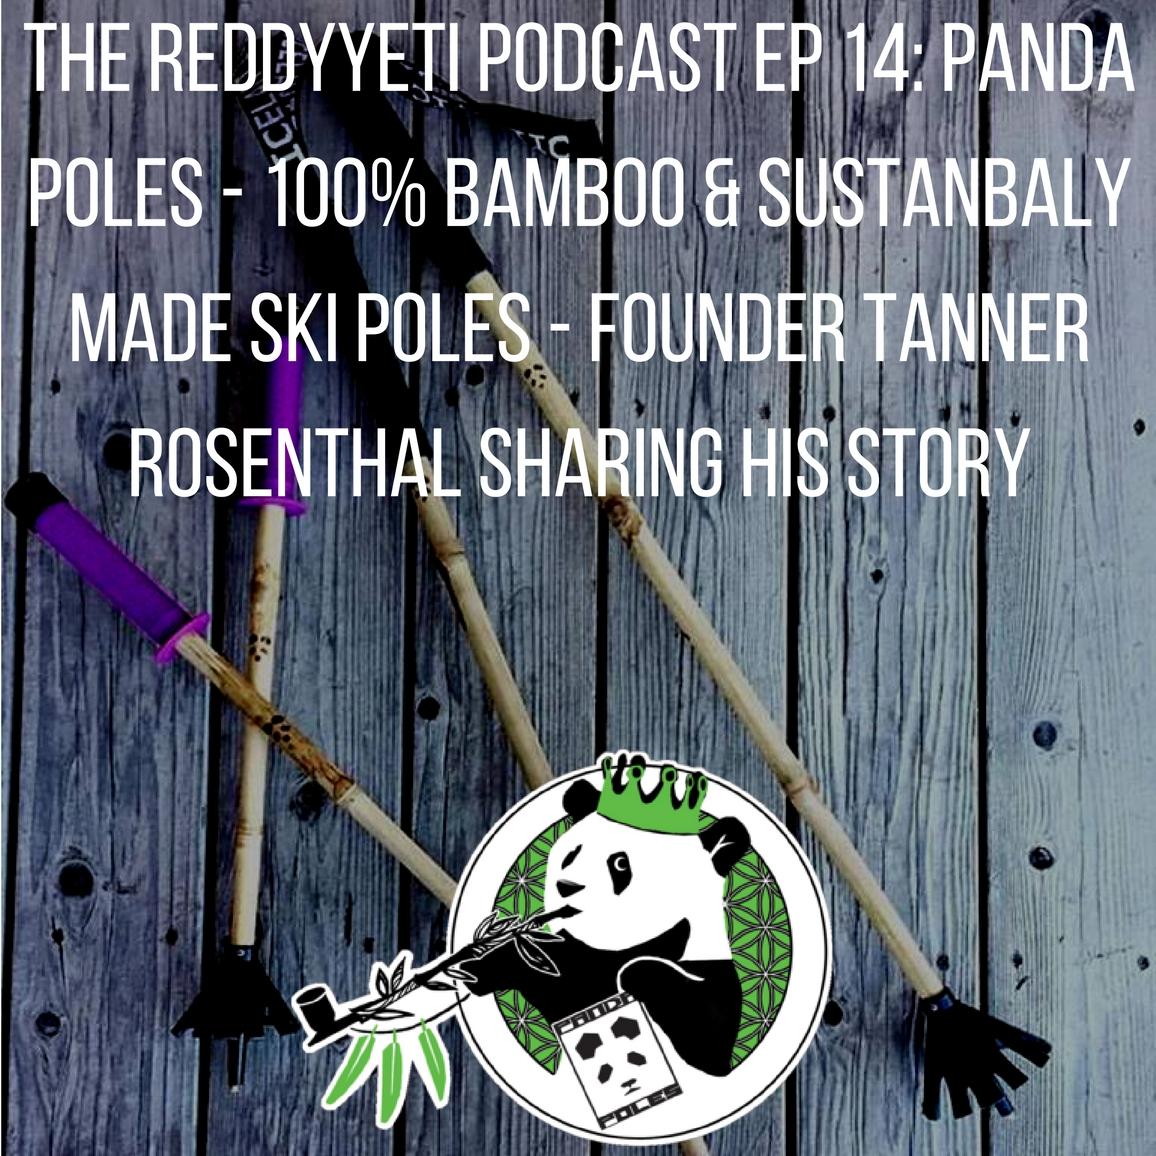 Panda poles Podcast Image.jpg